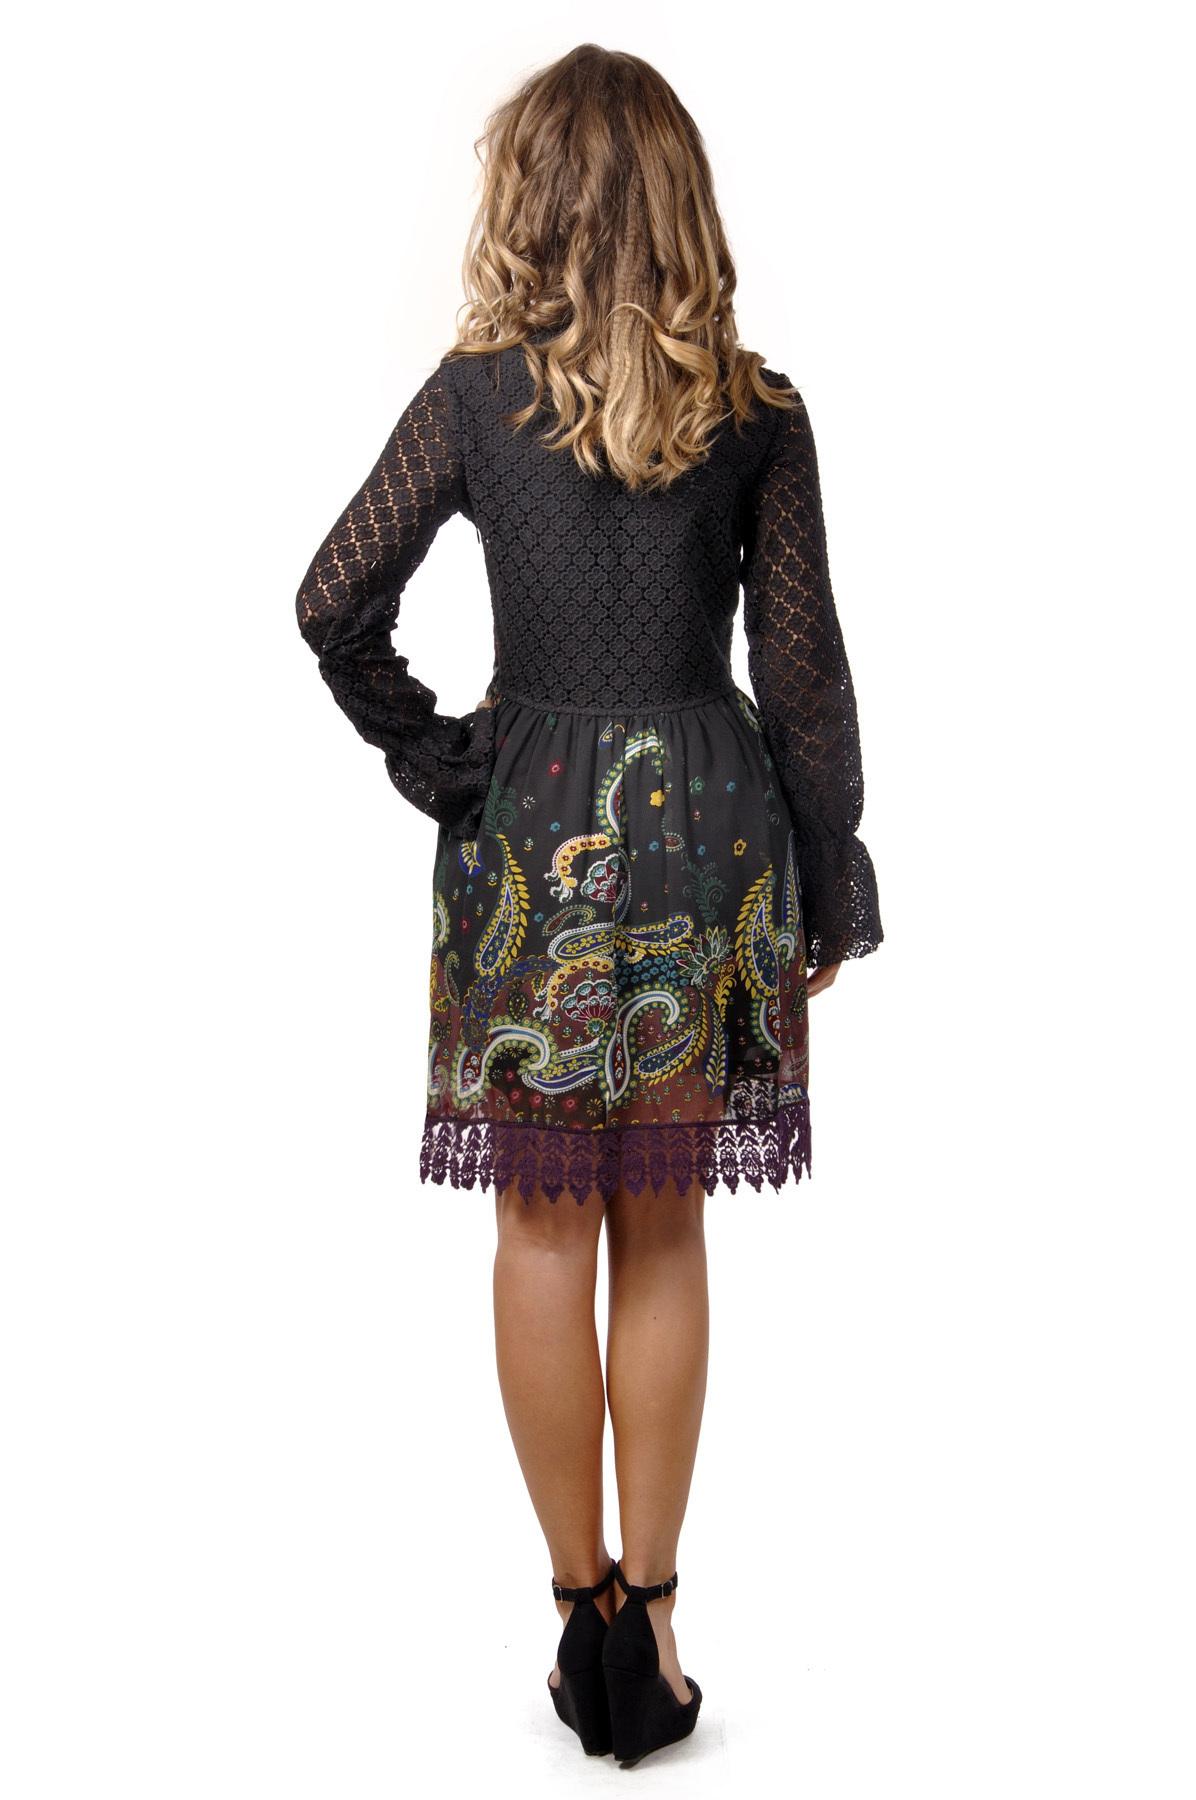 Savage Culture: Lounge In Love Arabesque Dress Alicia